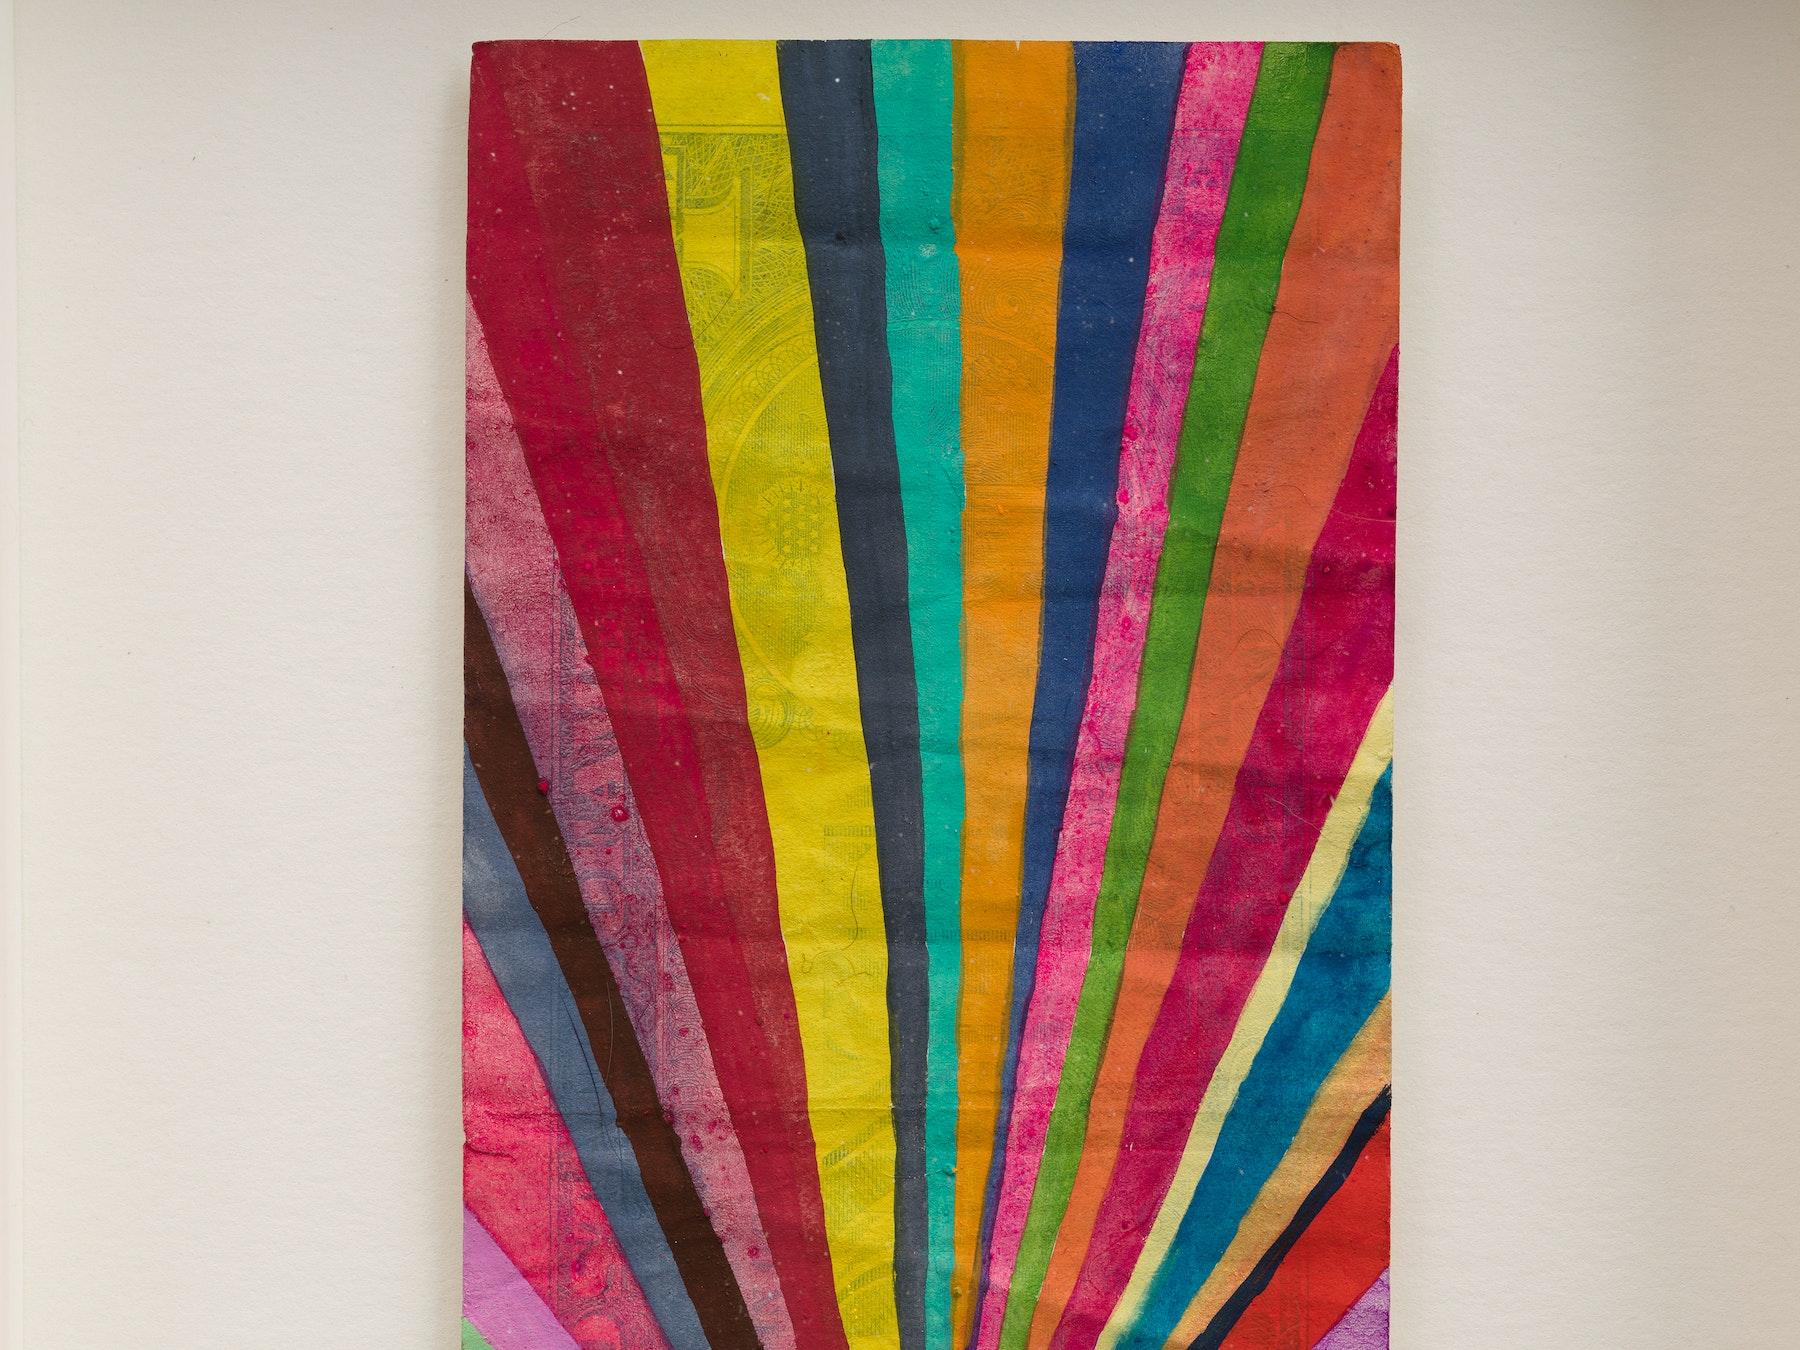 "Sarah Cain ""$ talisman,"" 2021 Acrylic on dollar bill 9 ¹⁄₂"" x 6 ¹⁄₄"" x 1 ³⁄₄"" [HxWxD] (24.13 x 15.85 x 4.45 cm) Inventory #CAS157 Courtesy of the artist and Vielmetter Los Angeles Photo credit: Jeff McLane"